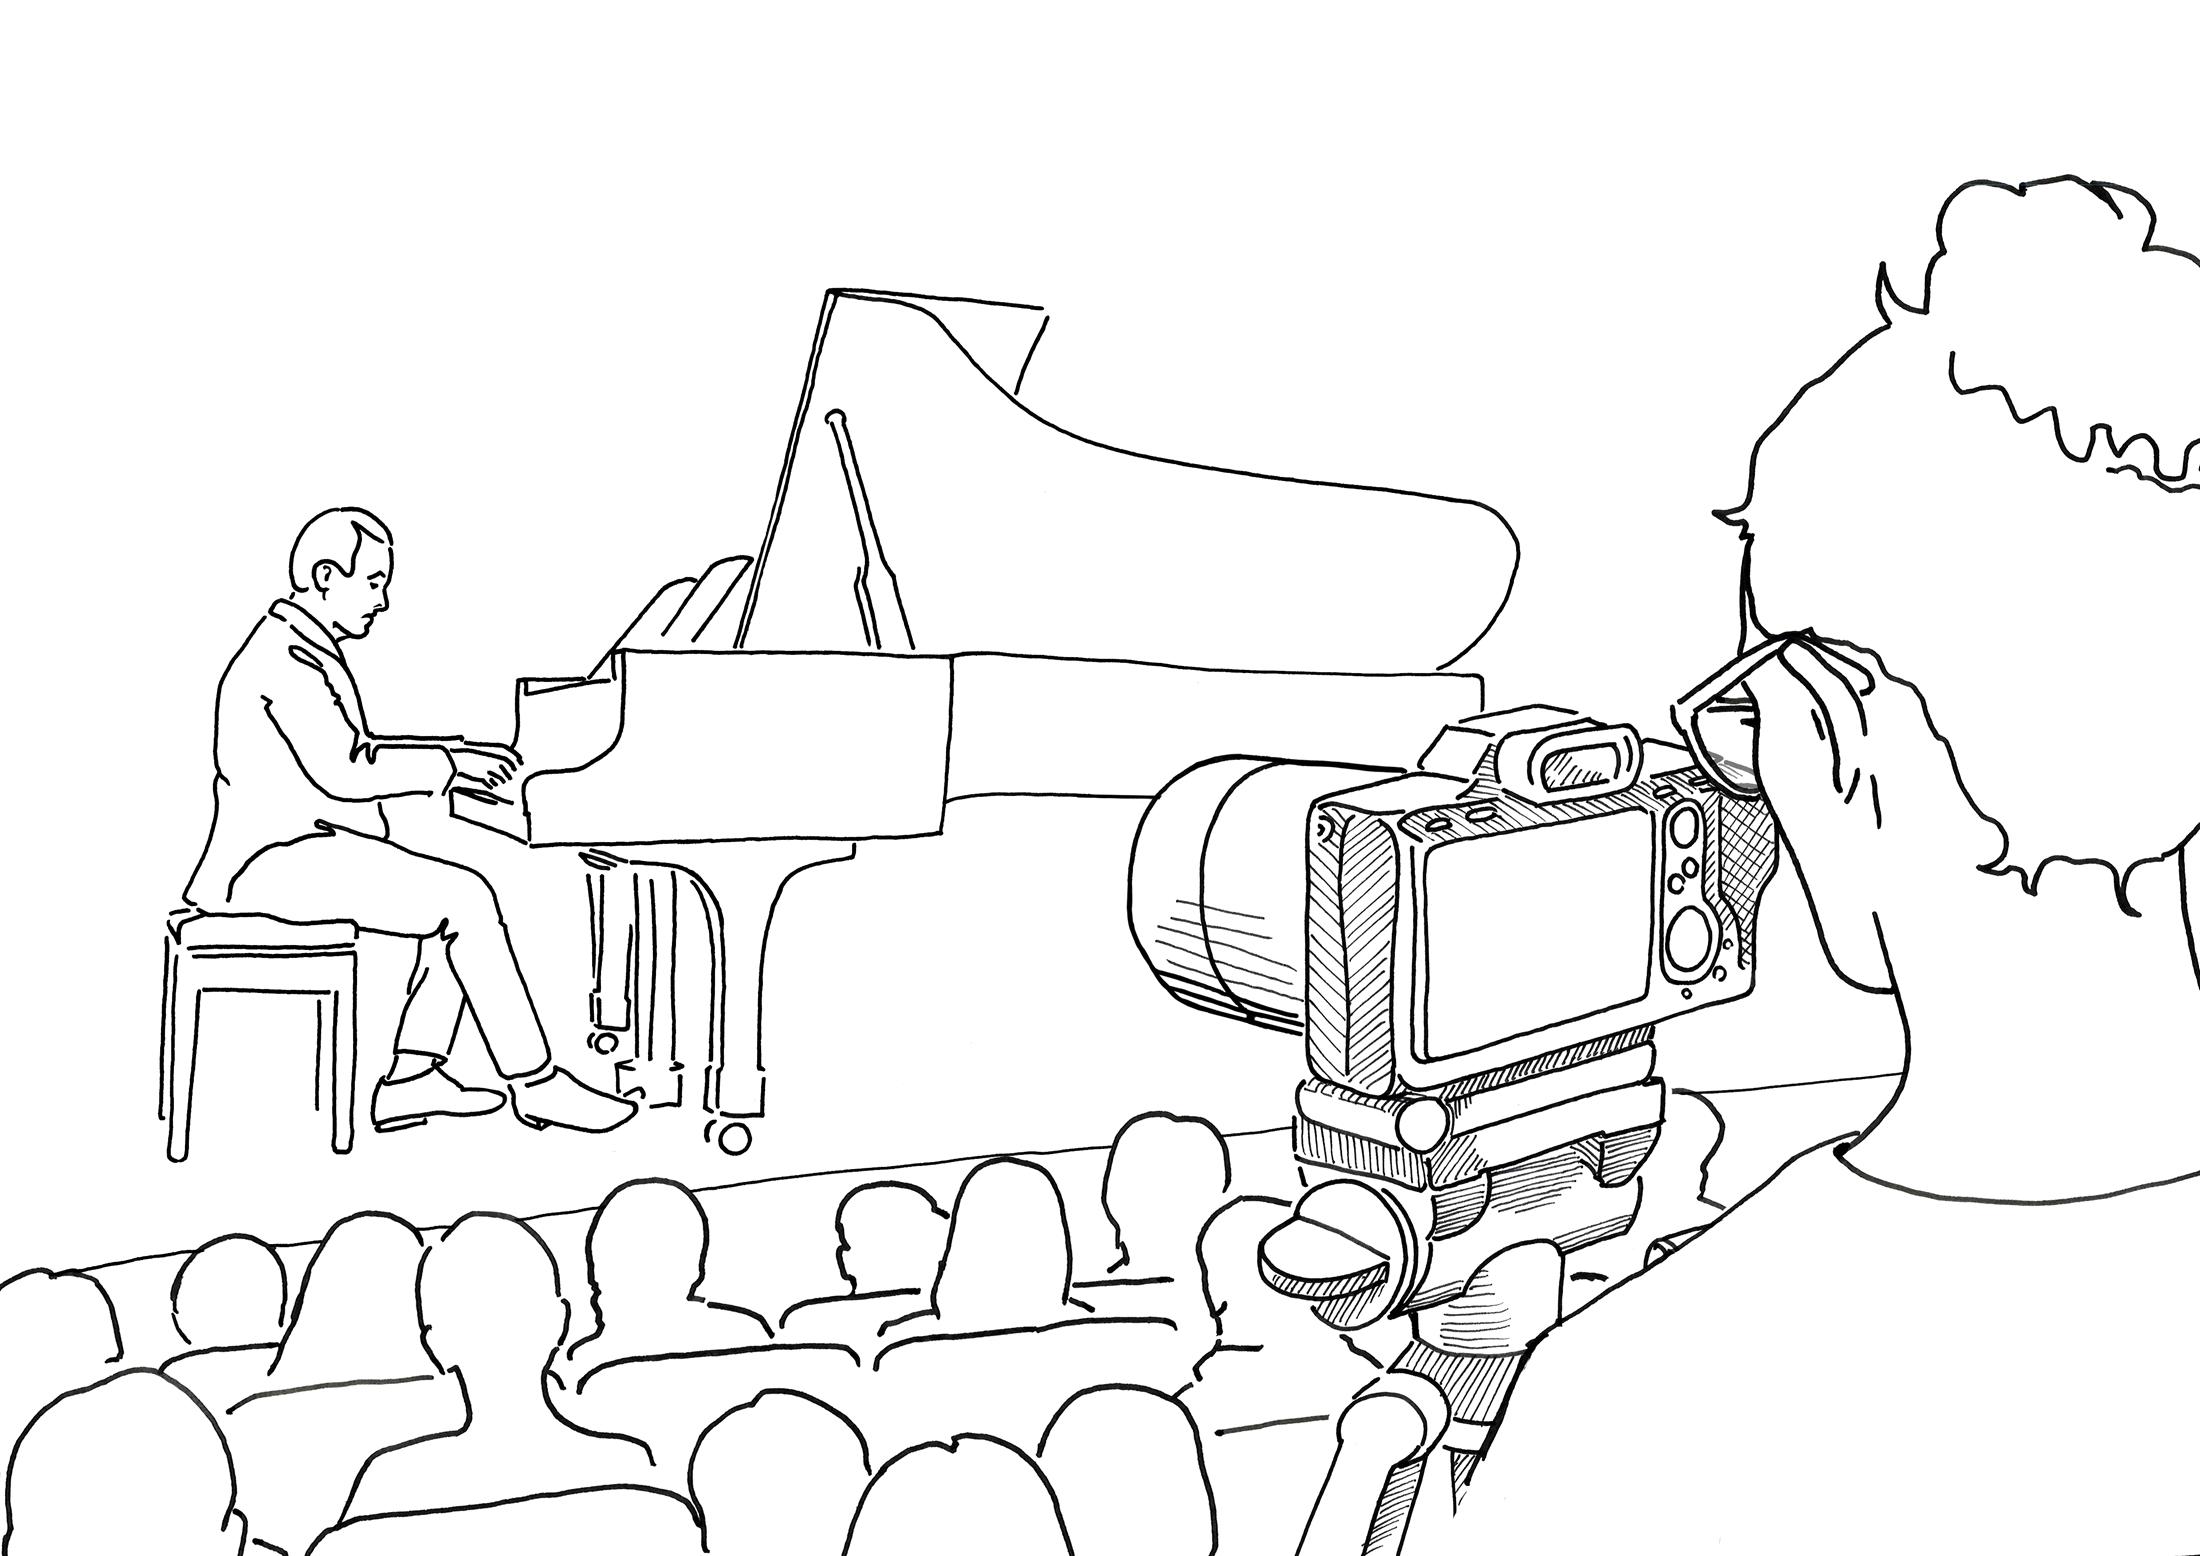 Illustration of concert setting, camera with no mic setup